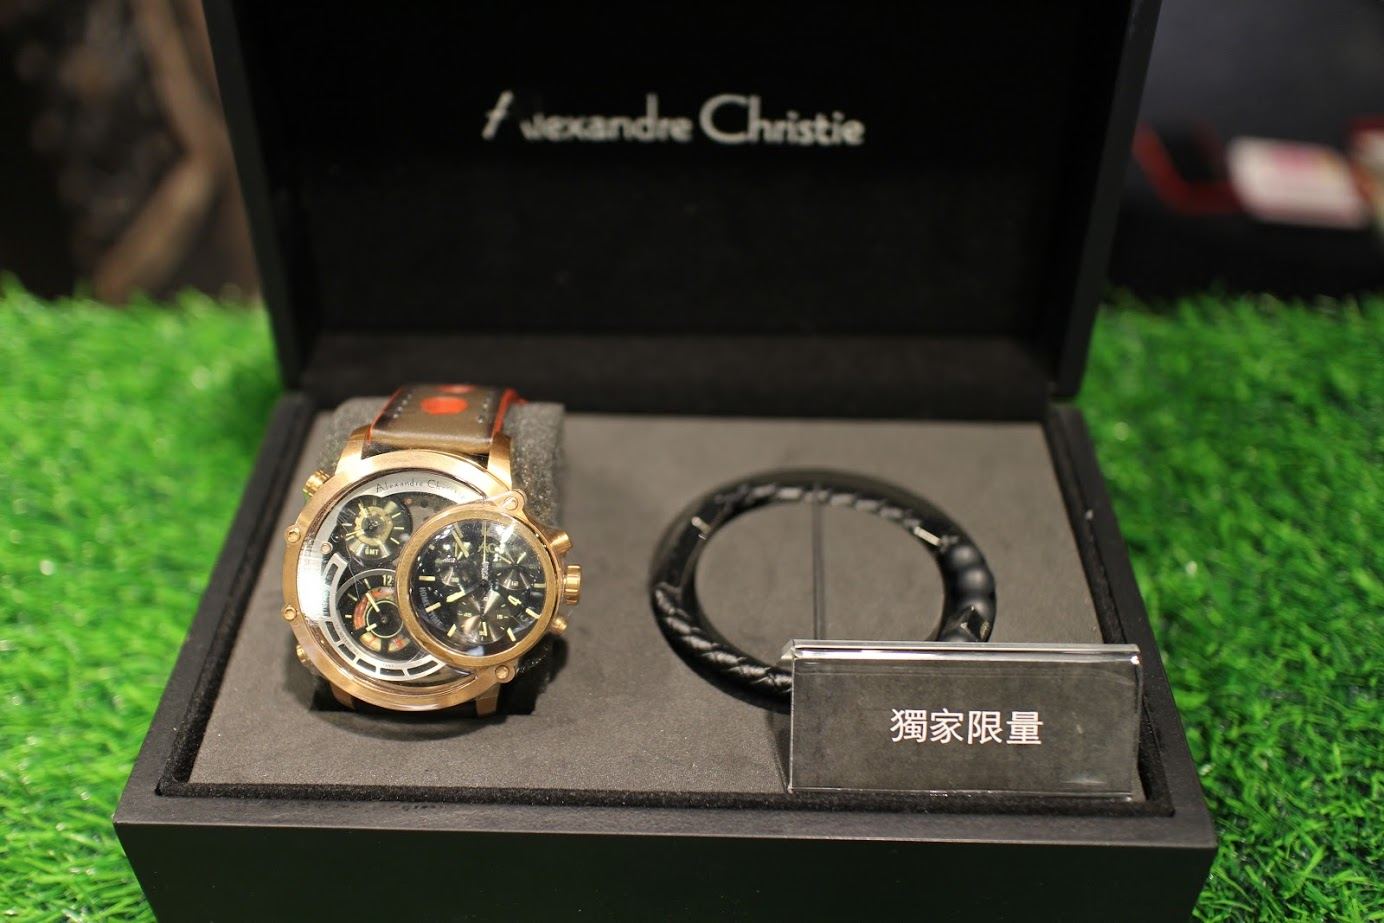 【Alexandre Christie手錶】西門高CP值瑞士機械錶、石英錶,親民價格絕對讓人驚嘆 @秤瓶樂遊遊